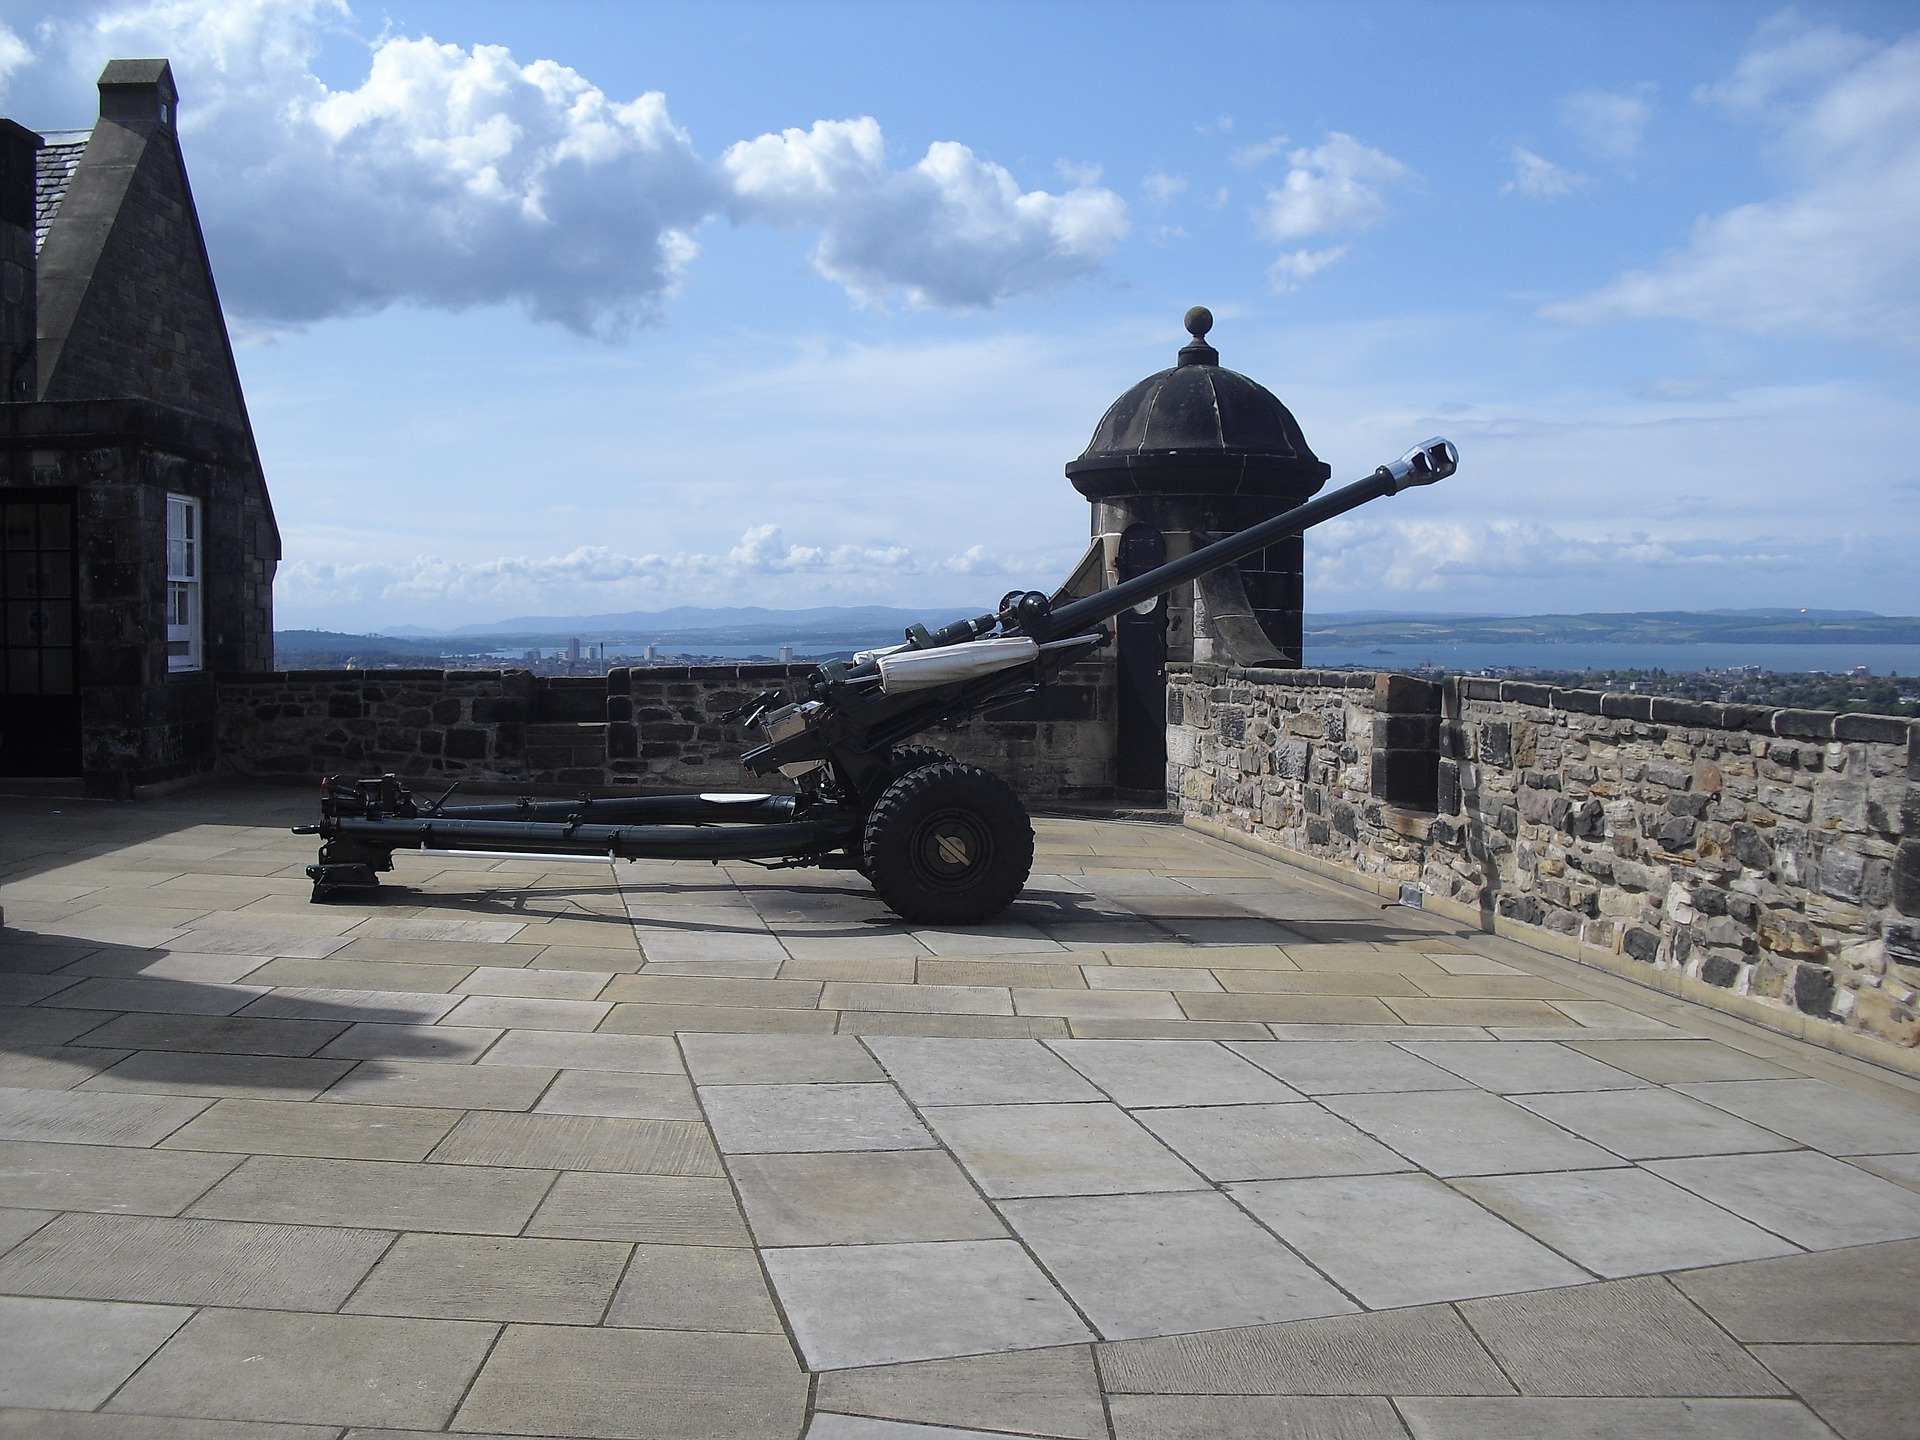 cannon-1122634_1920